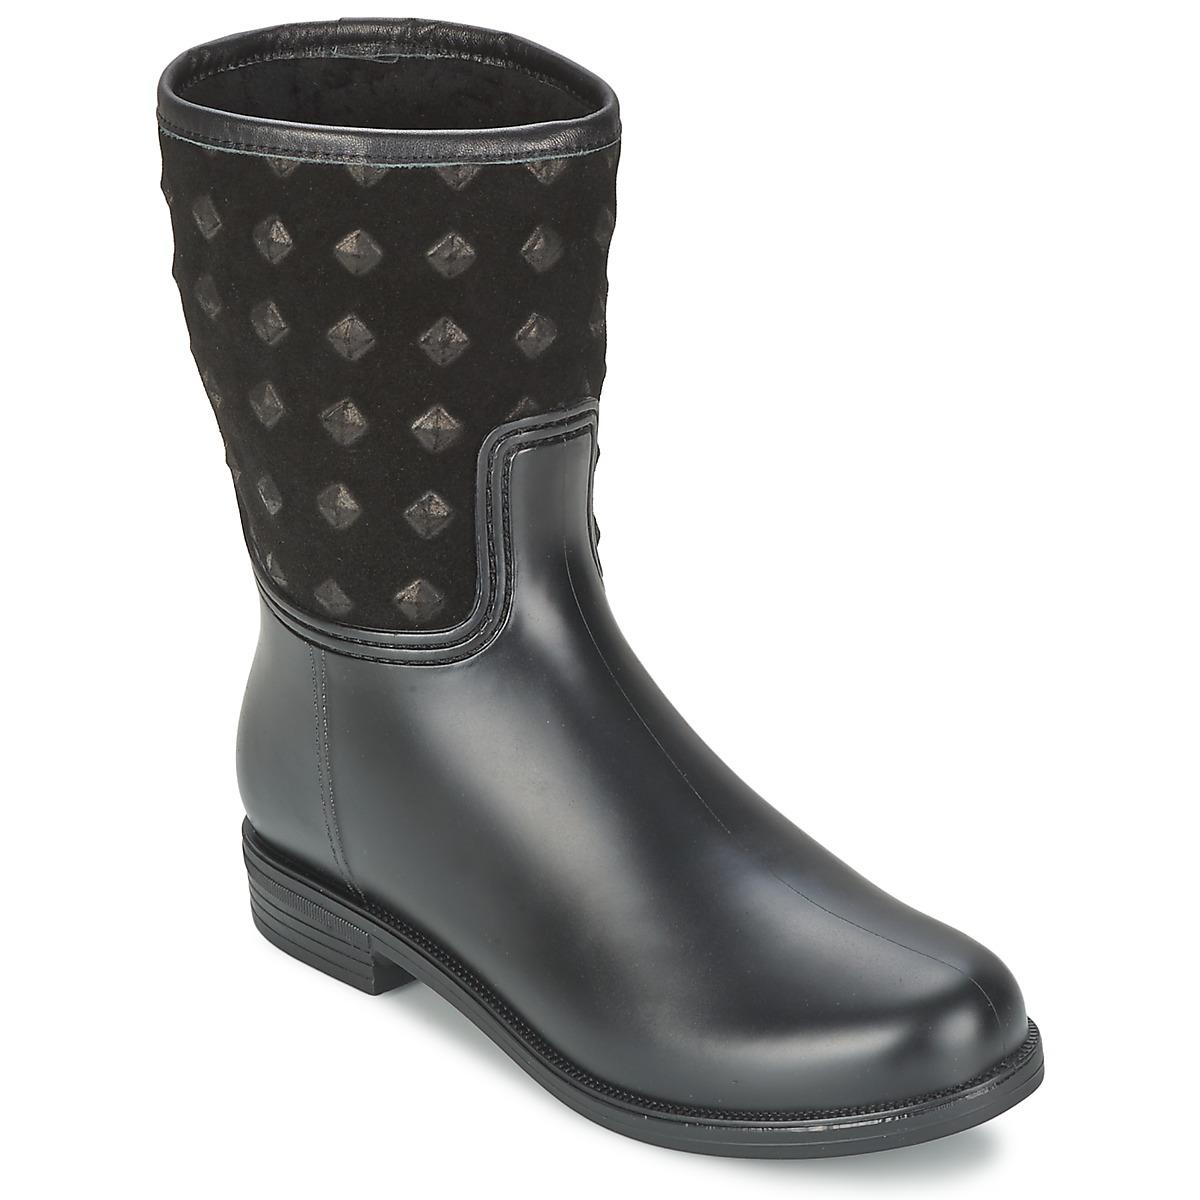 SuperTrash SUZY ! € 52,90 Damen Boots Schuhe Spartoode bei